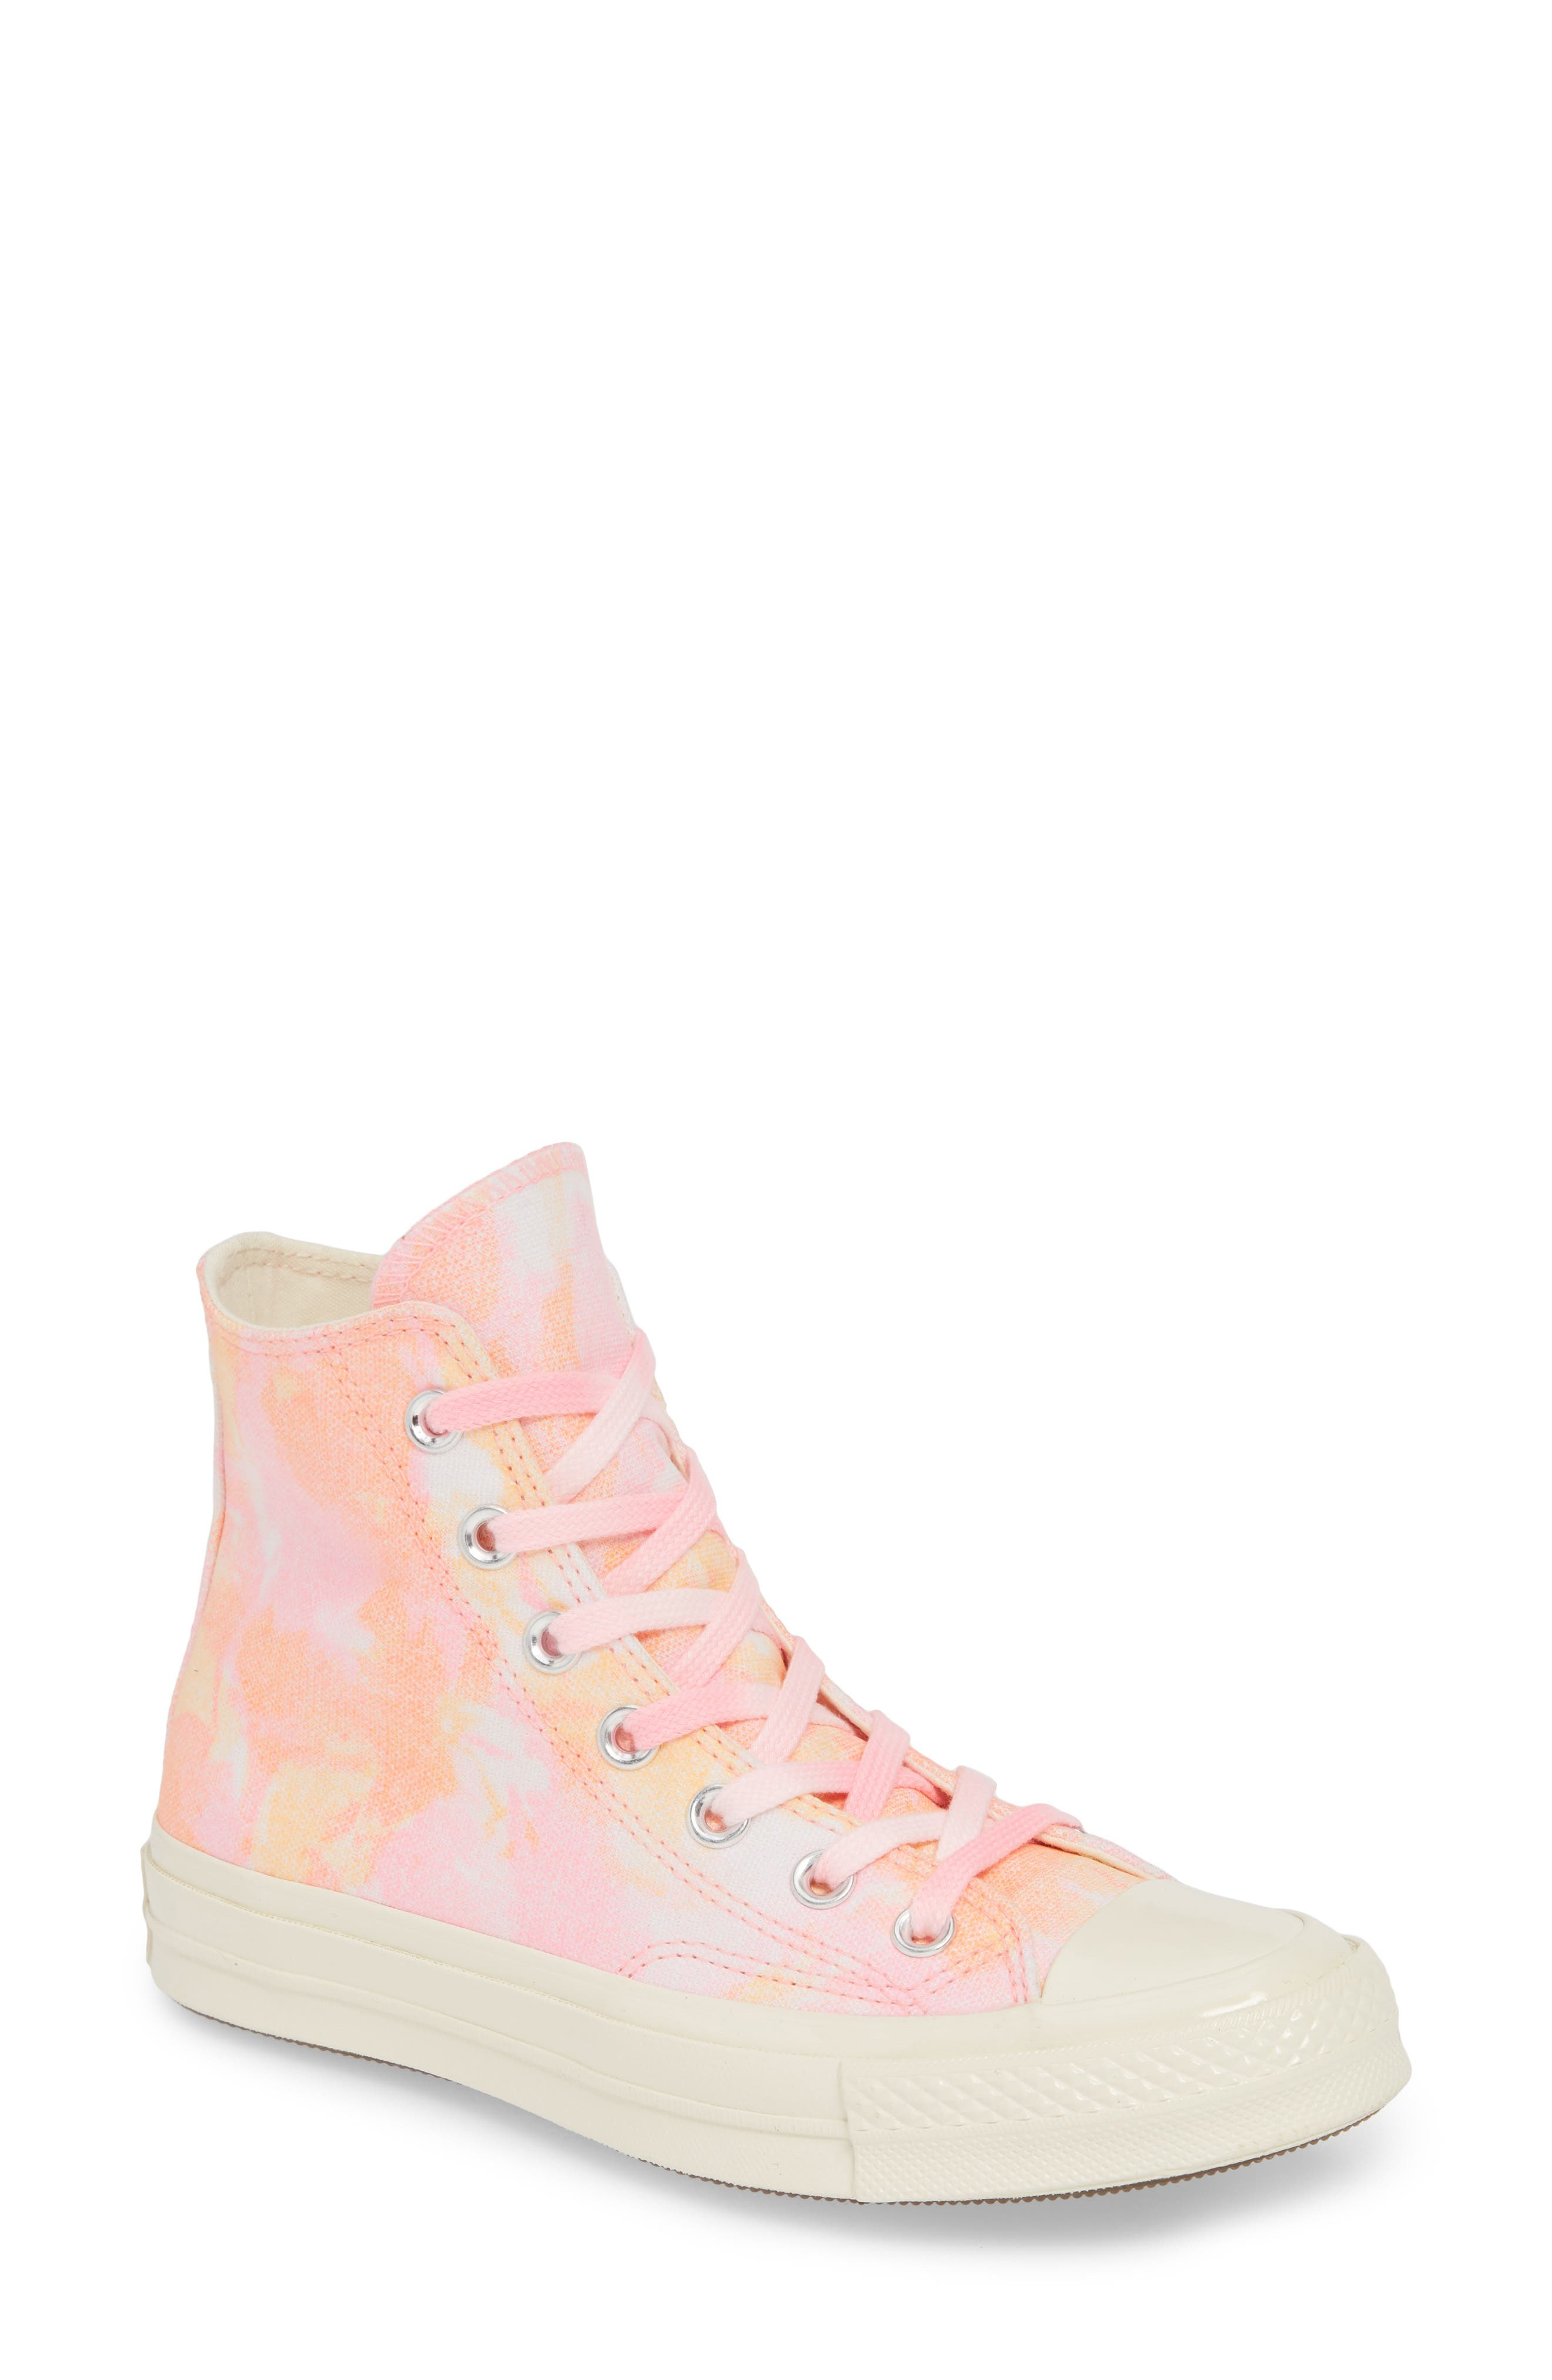 Converse Chuck Taylor All Star 70 High Top Sneaker- Pink